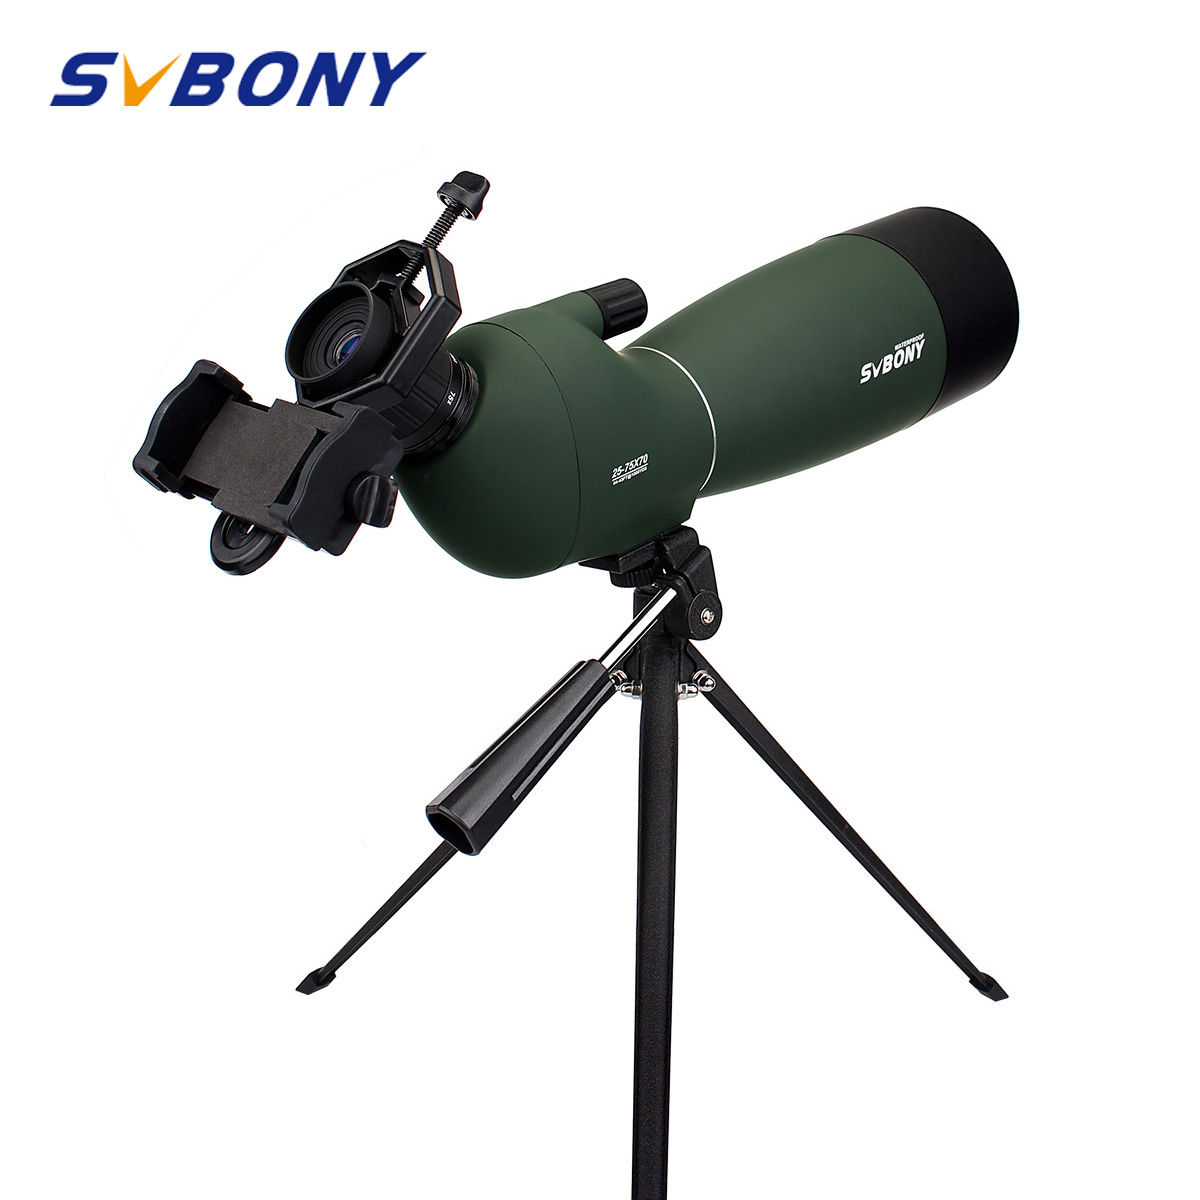 Svbony SV28 50/60/70mm אכון היקף זום טלסקופ עמיד למים Birdwatch ציד משקפת & אוניברסלי טלפון מתאם mountF9308 אופטיקה חיצונית לציד, ירי, חץ וקשת, צפרות, אסטרונומיה